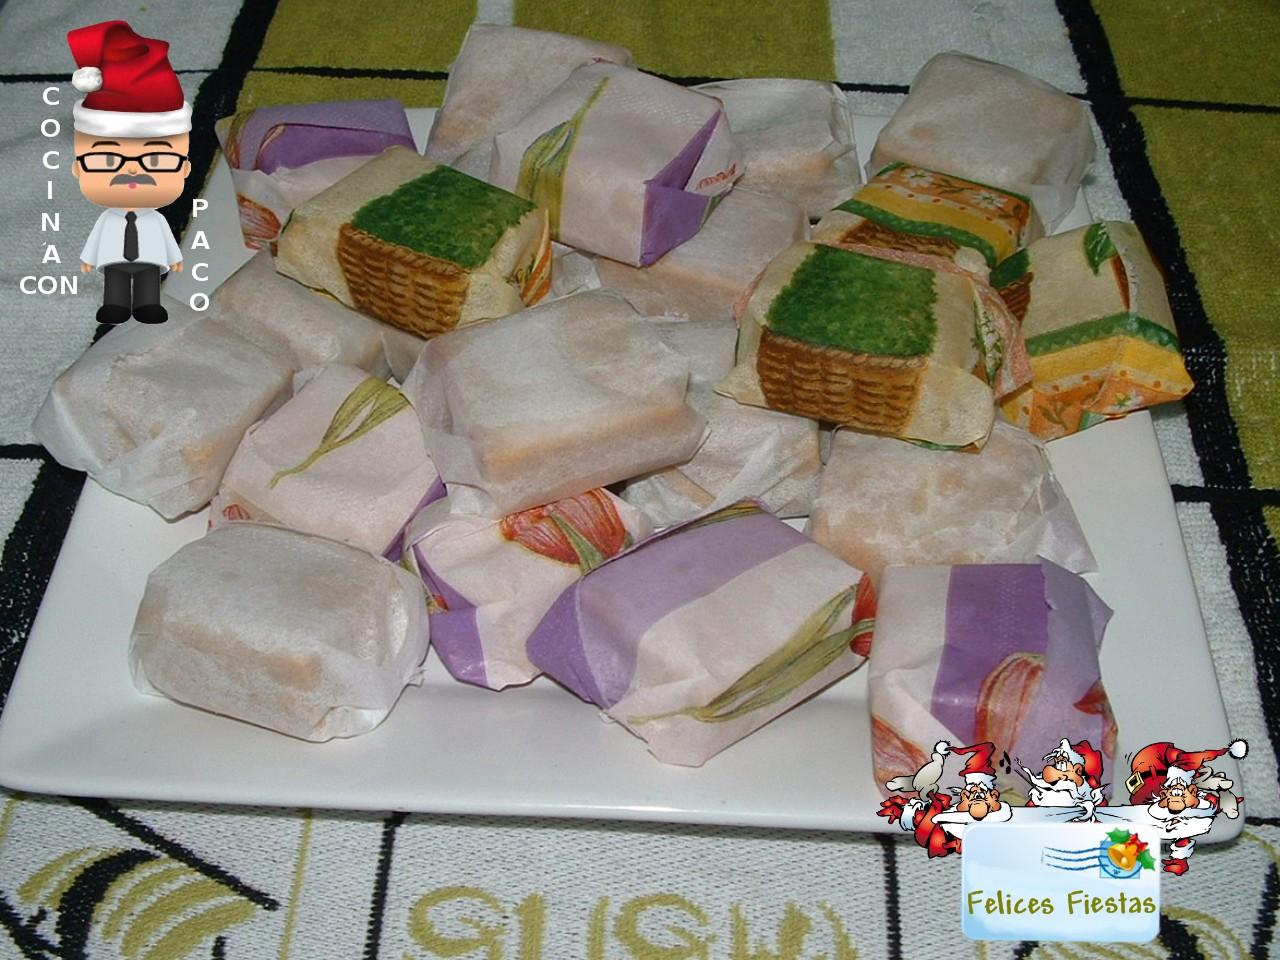 Cocina con paco polvorones caseros - Cocina con paco ...